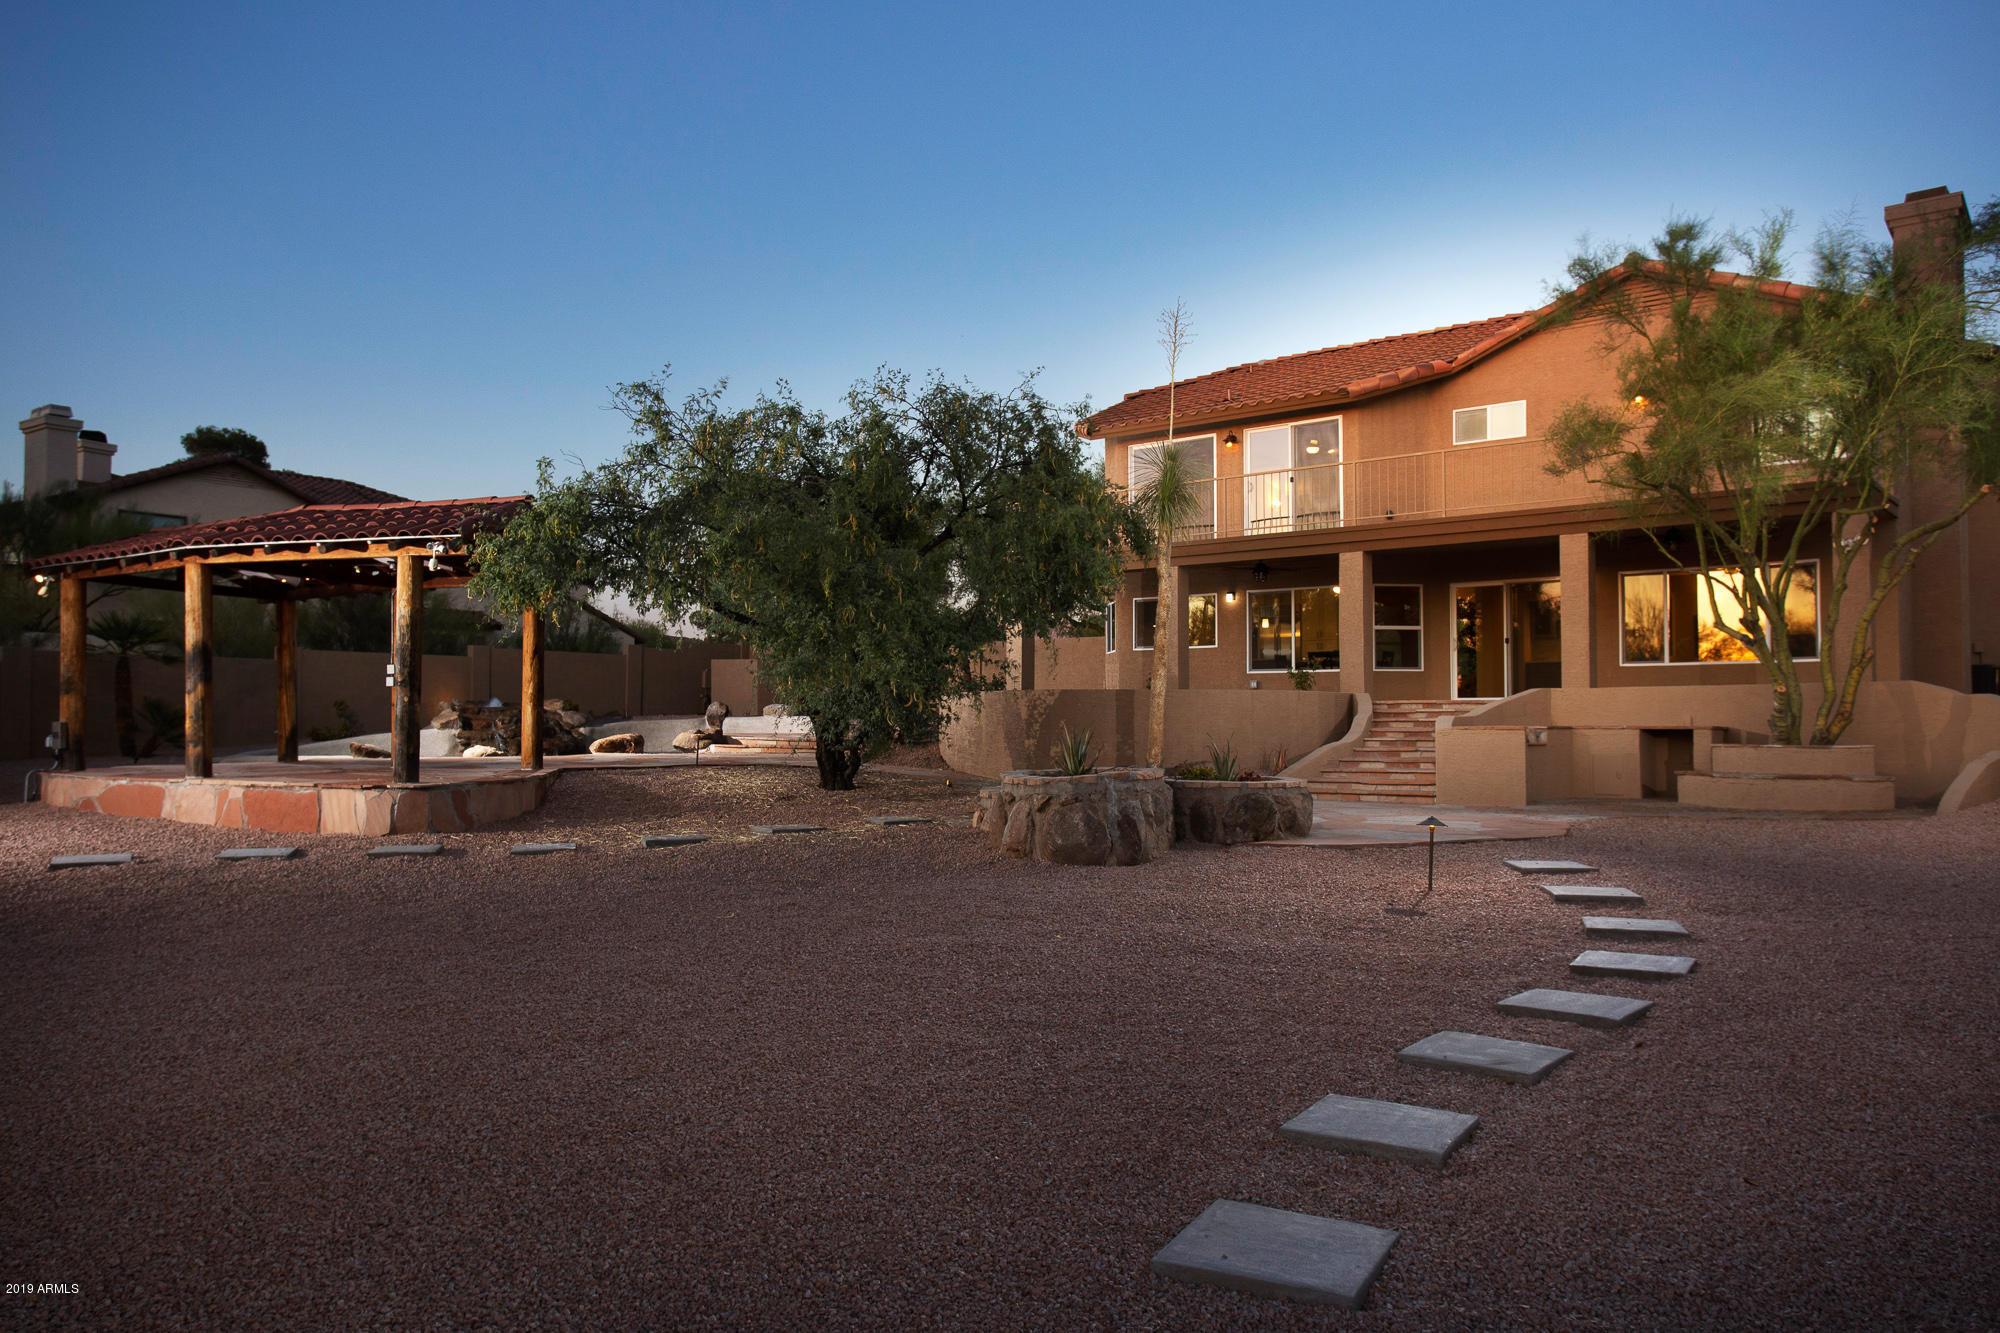 MLS 5951336 26340 N 82ND Street, Scottsdale, AZ 85255 Scottsdale AZ Private Pool